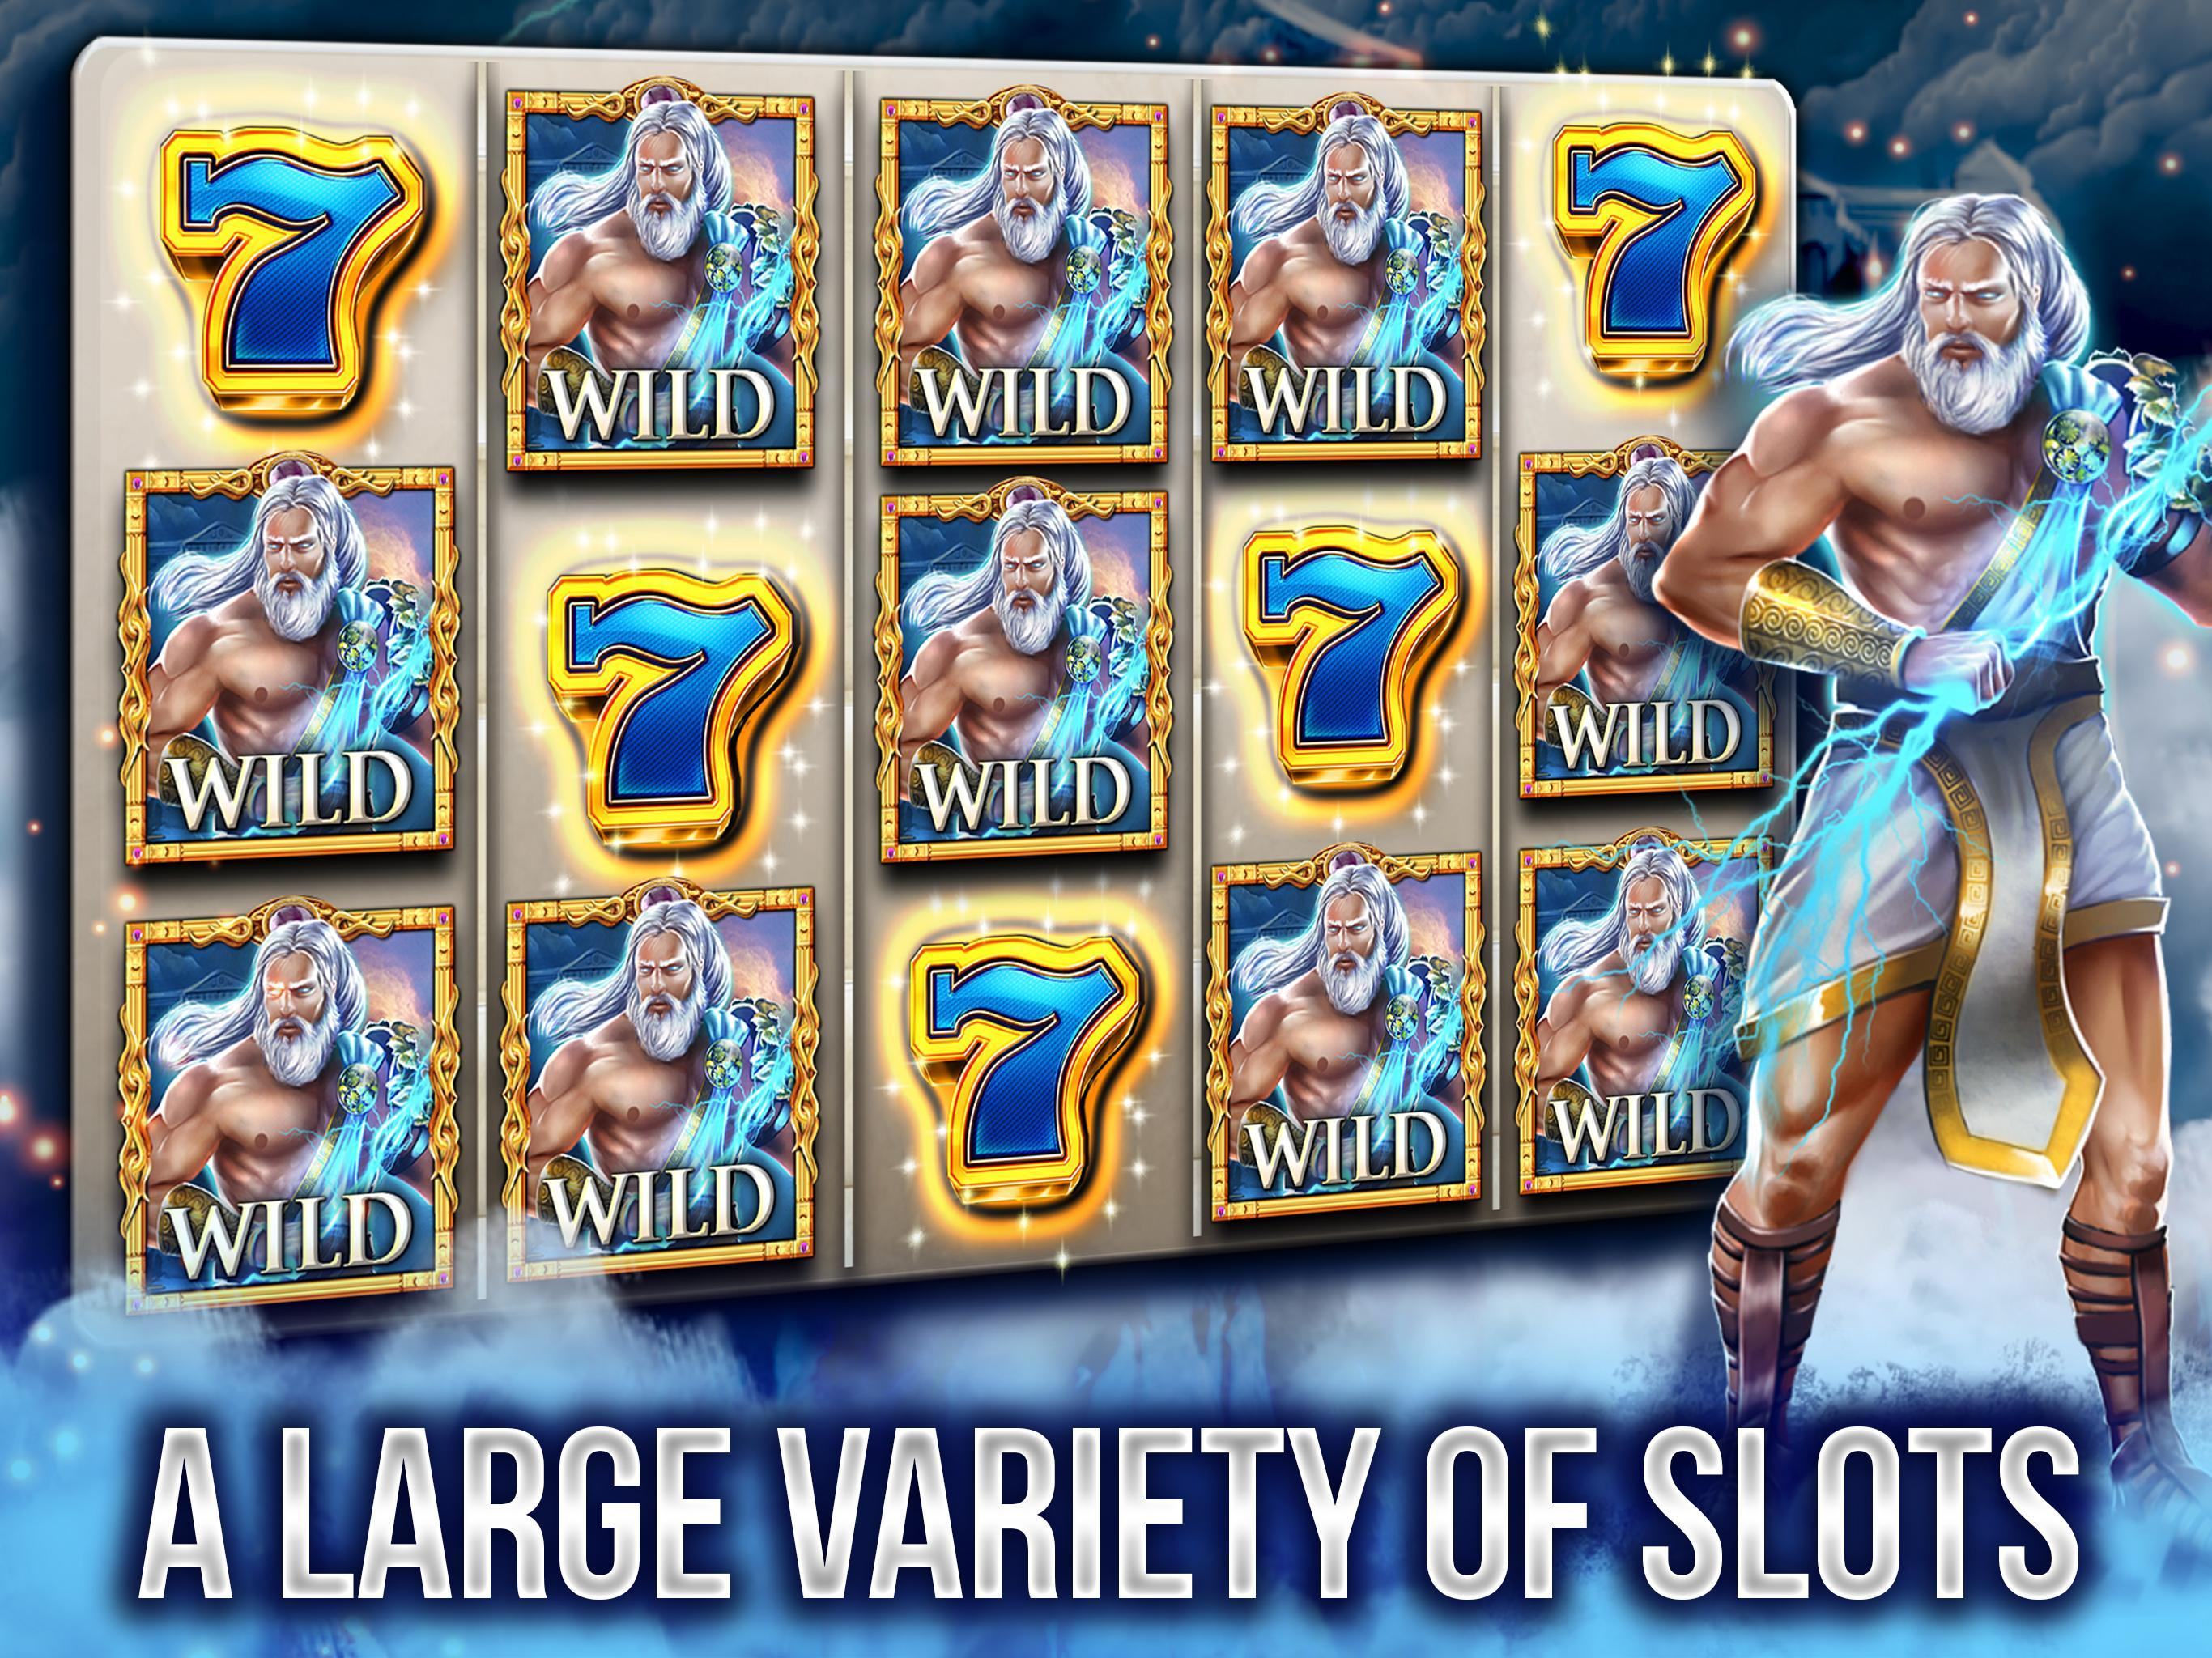 Slots - Epic Casino Games 2.8.3402 Screenshot 12